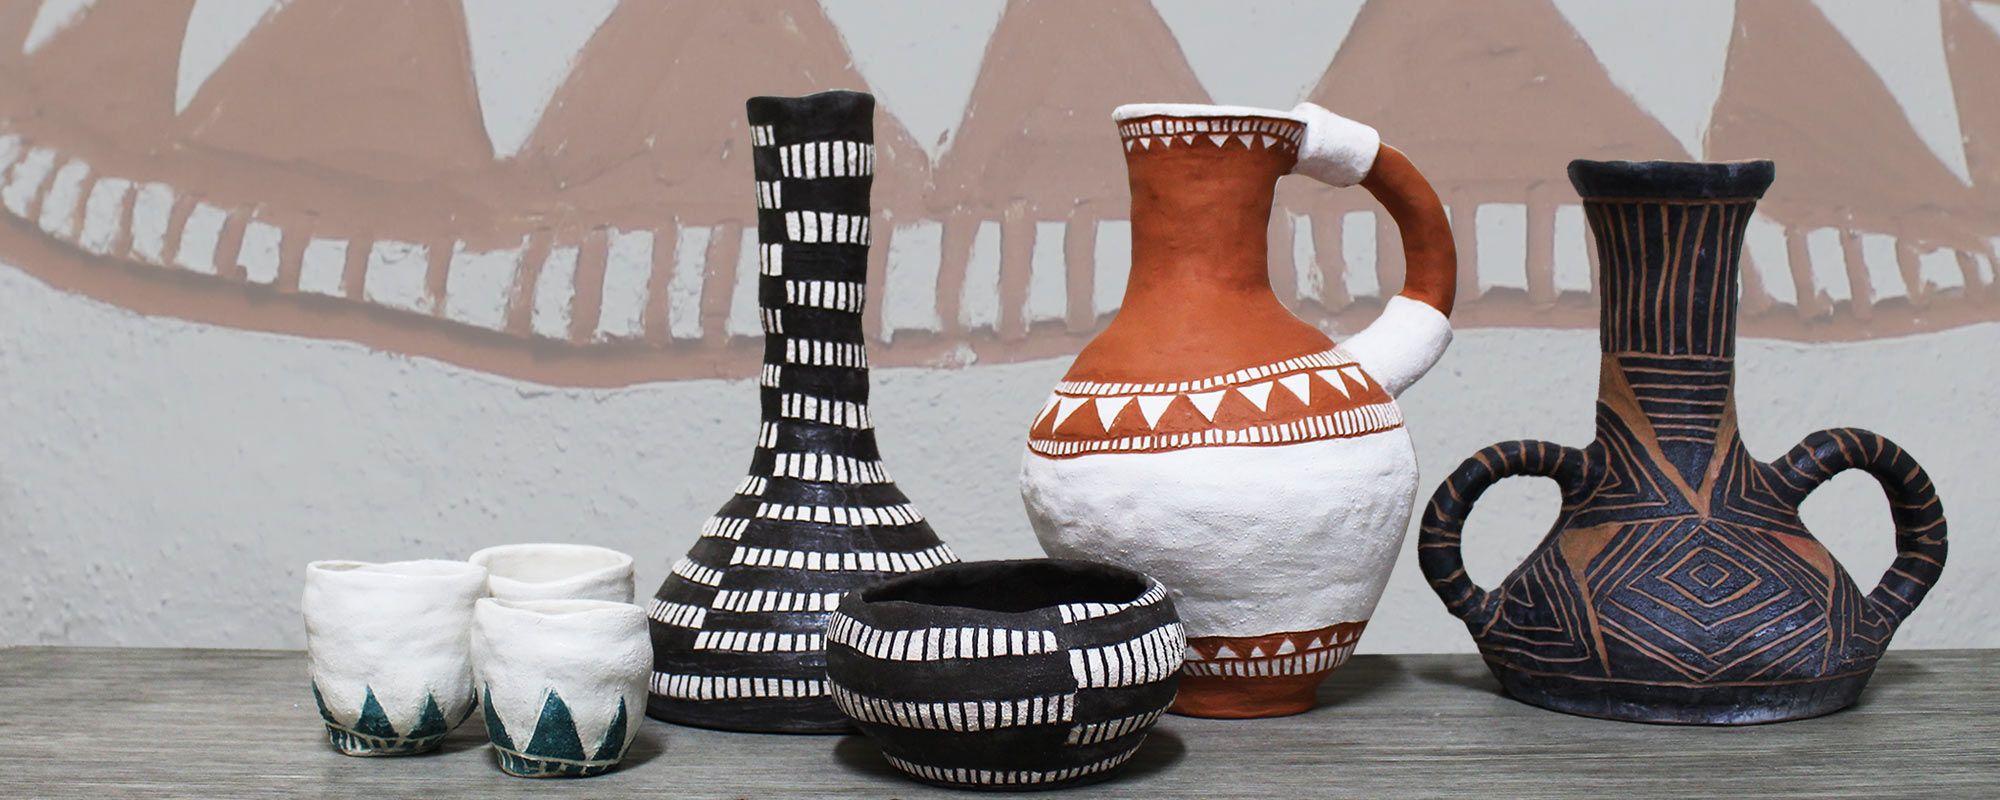 Patmian Ceramics